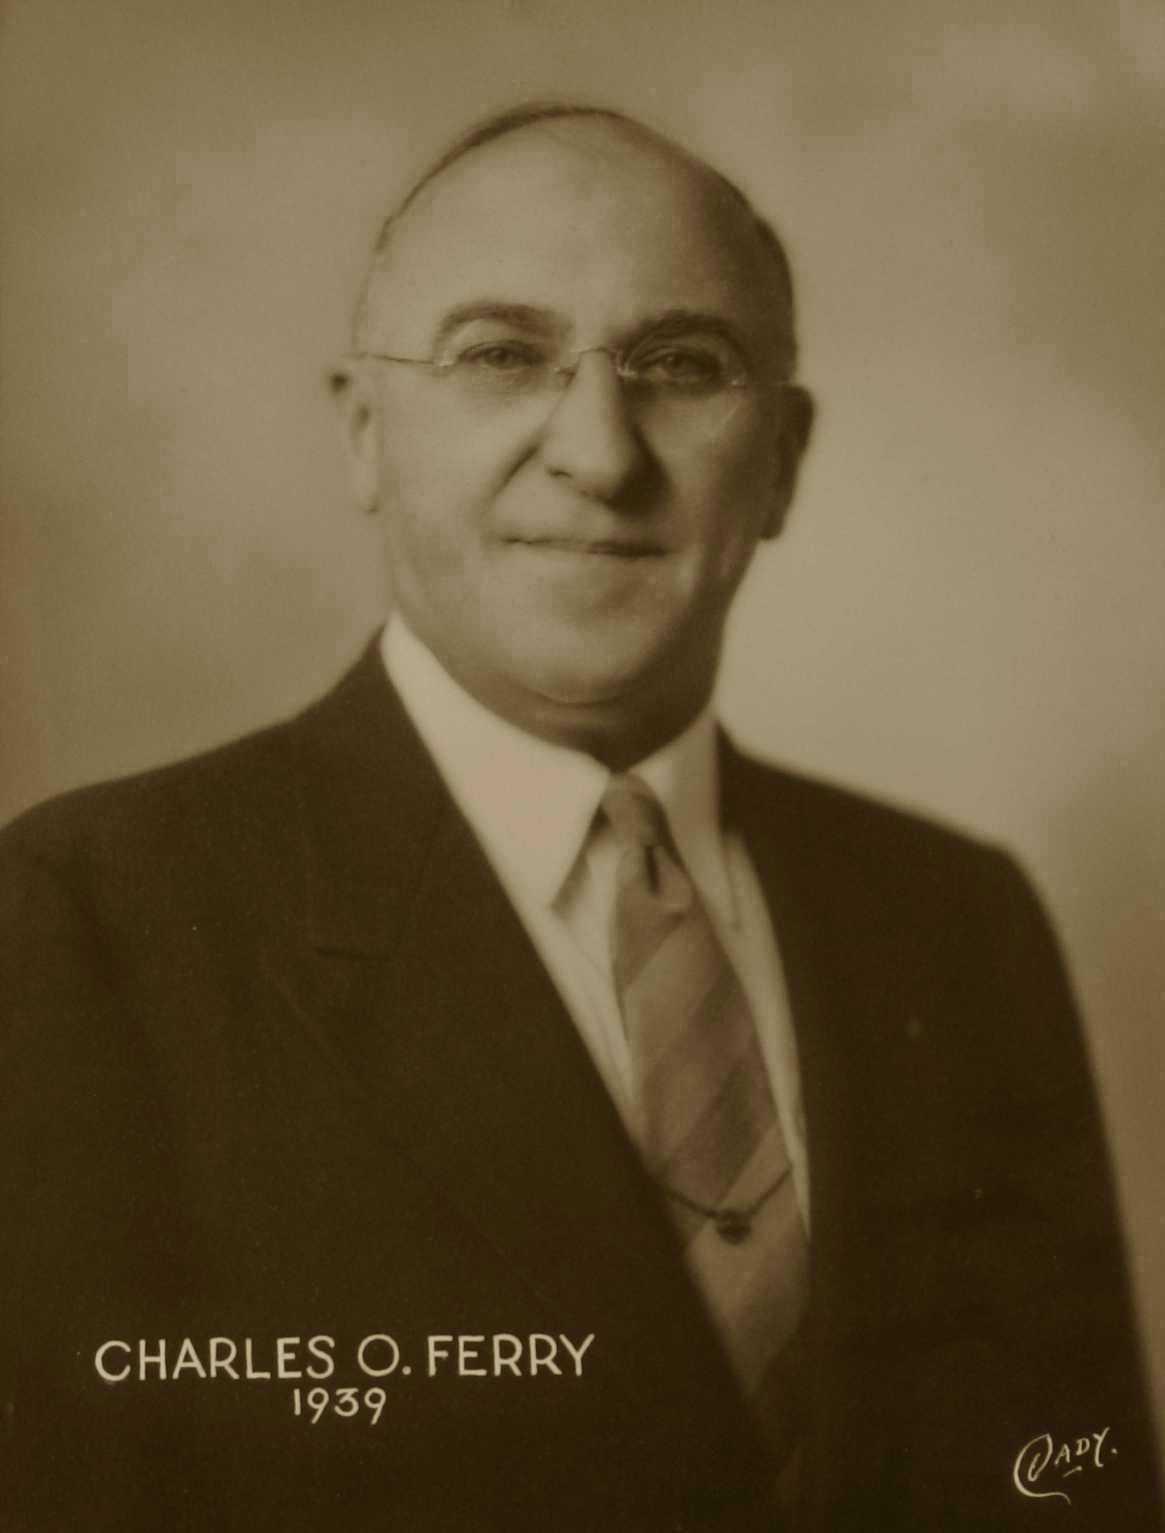 Charles O. Ferry, 1939